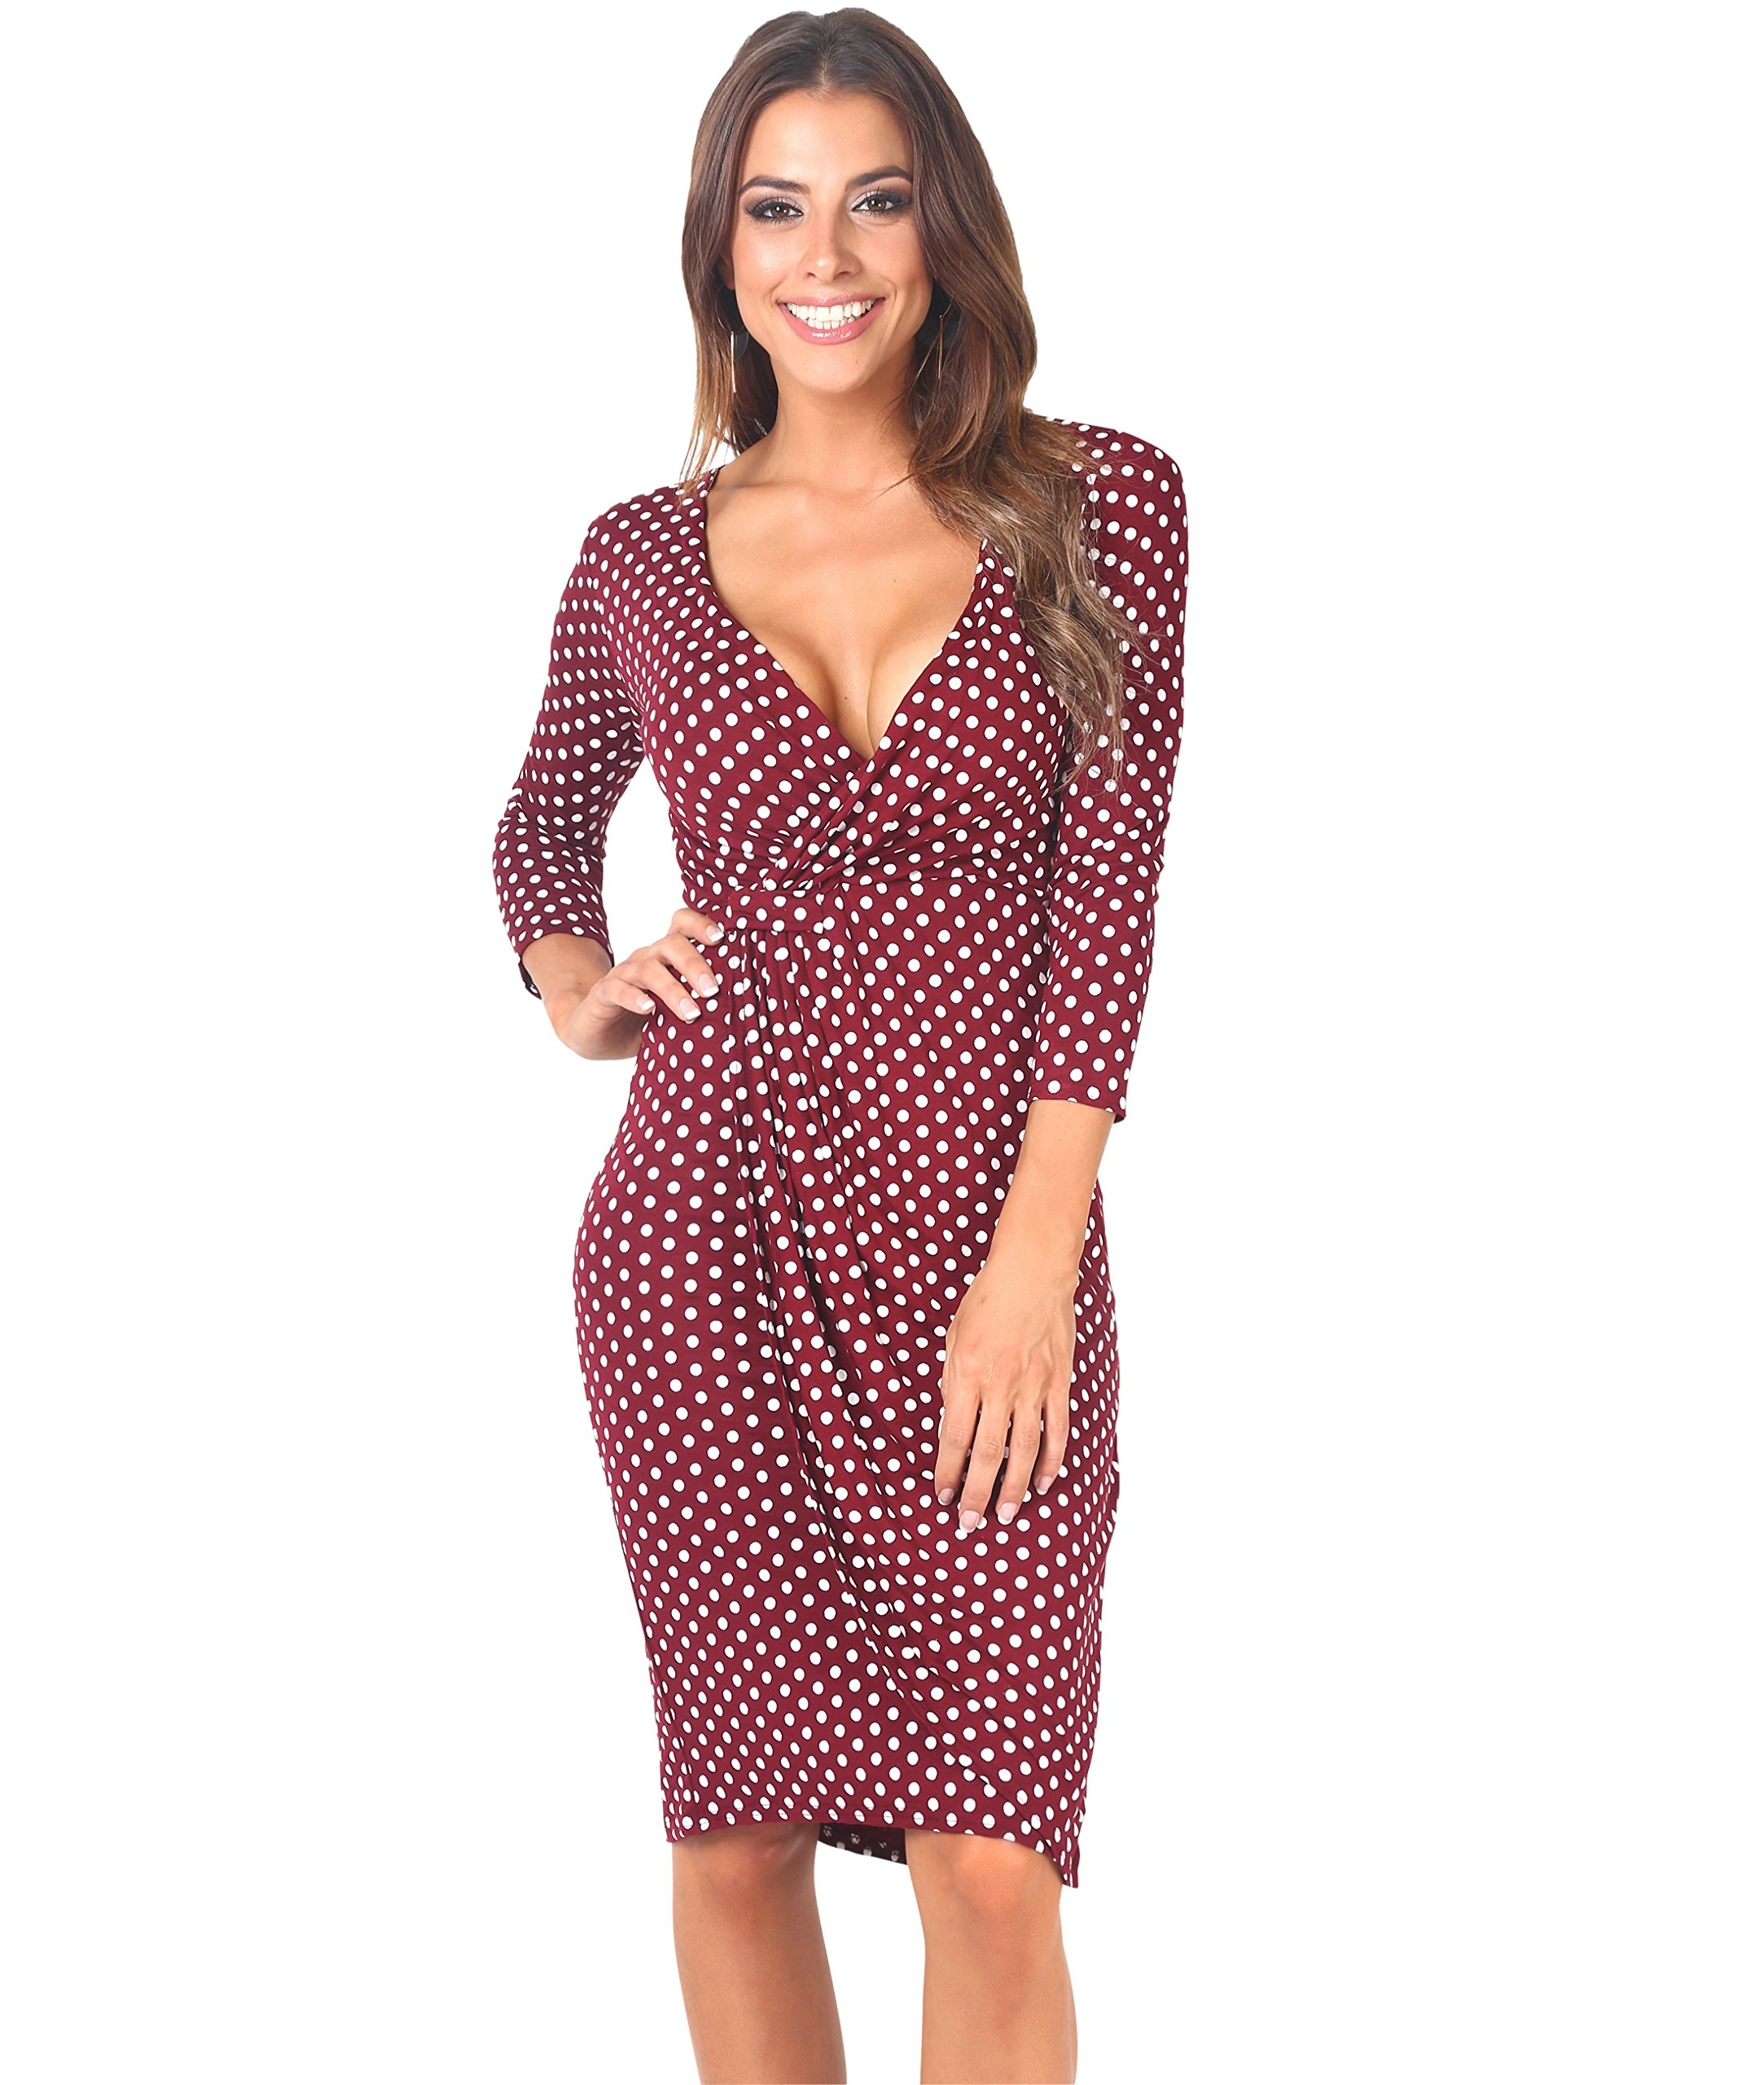 KRISP 3/4 Polka Dress (Size UK 10/US 6)(6487-WIN-10)